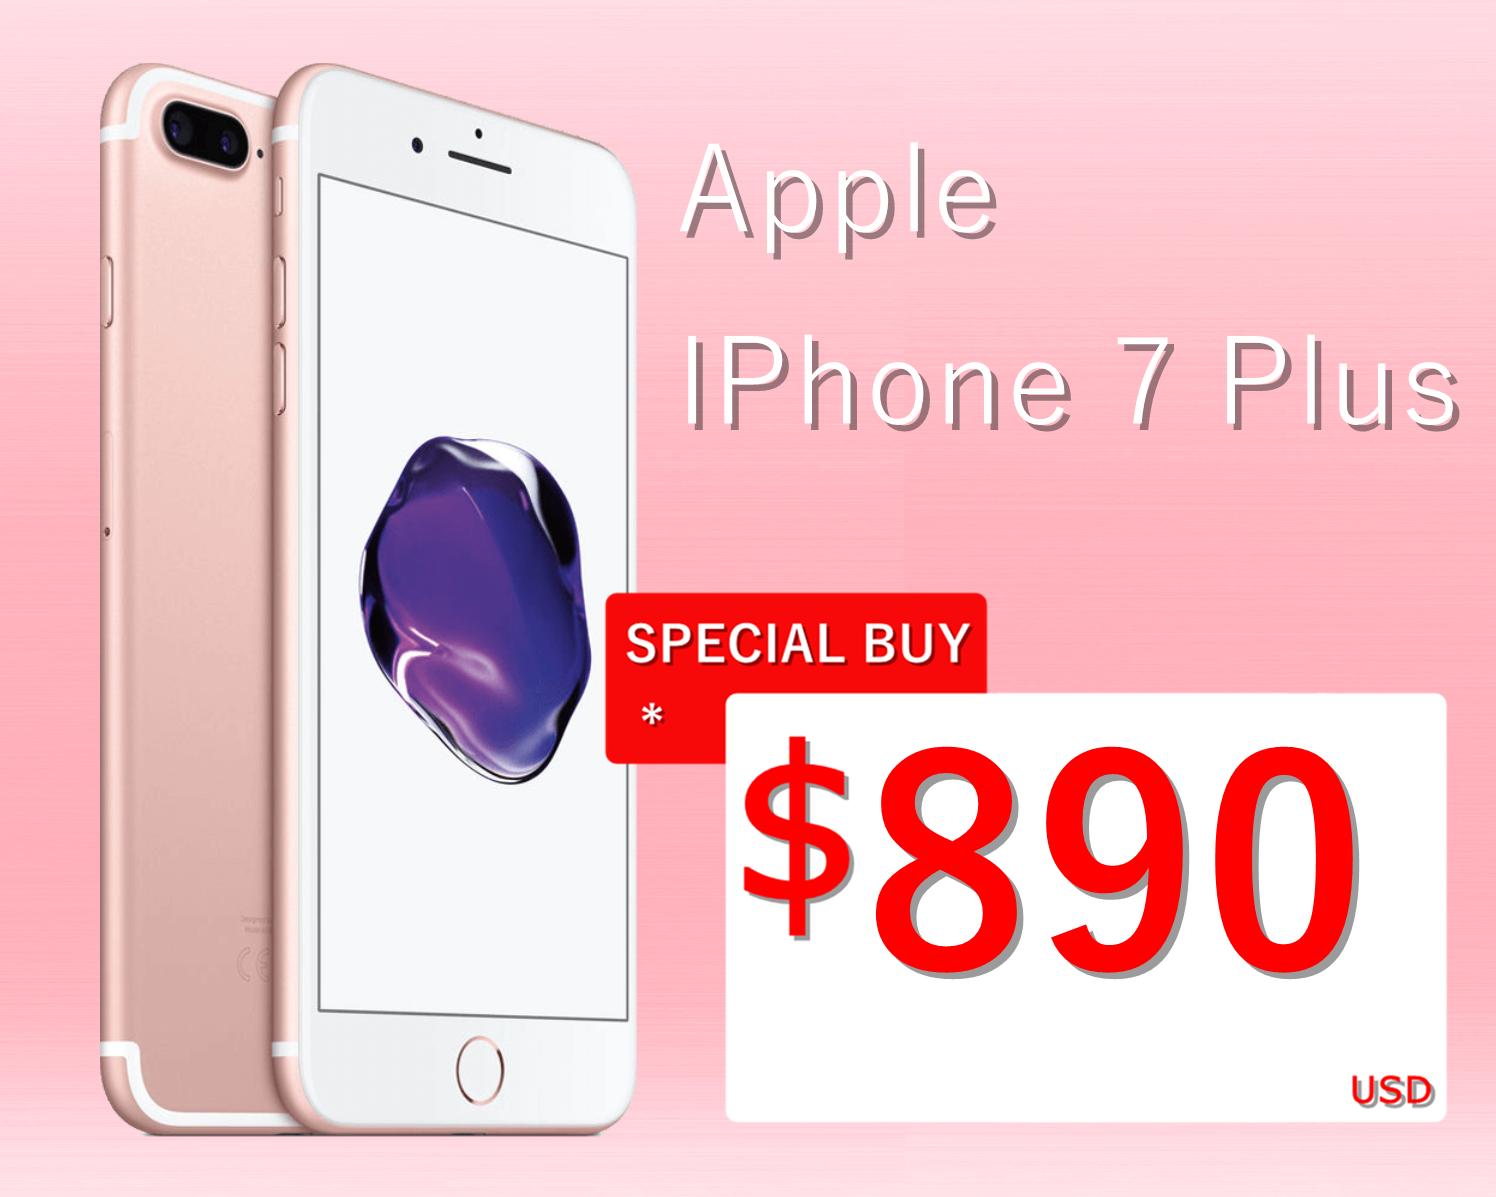 sale-apple-iphone7plus-bqshopestore.com.png